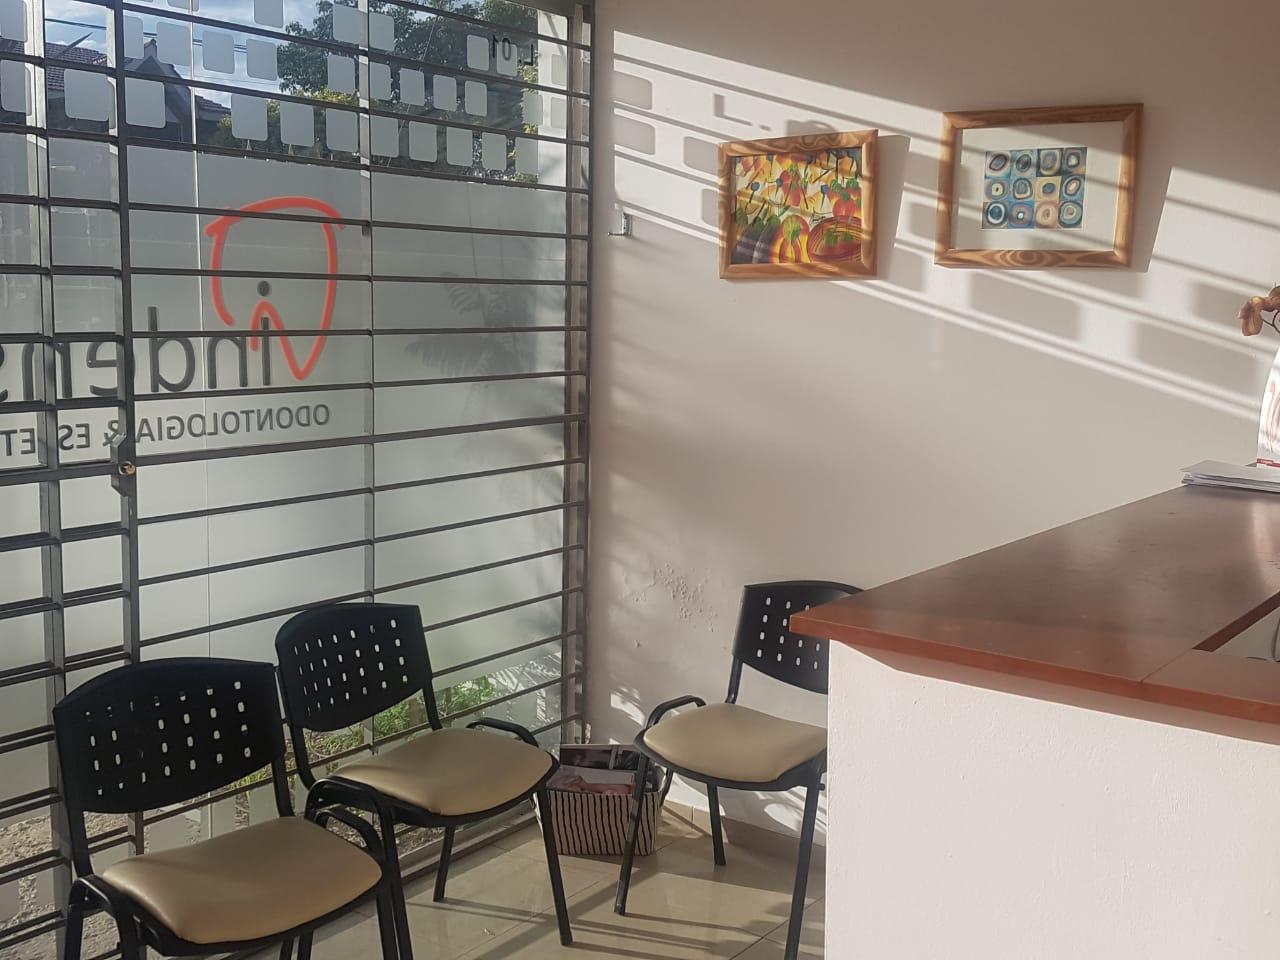 sala de espera odontologo